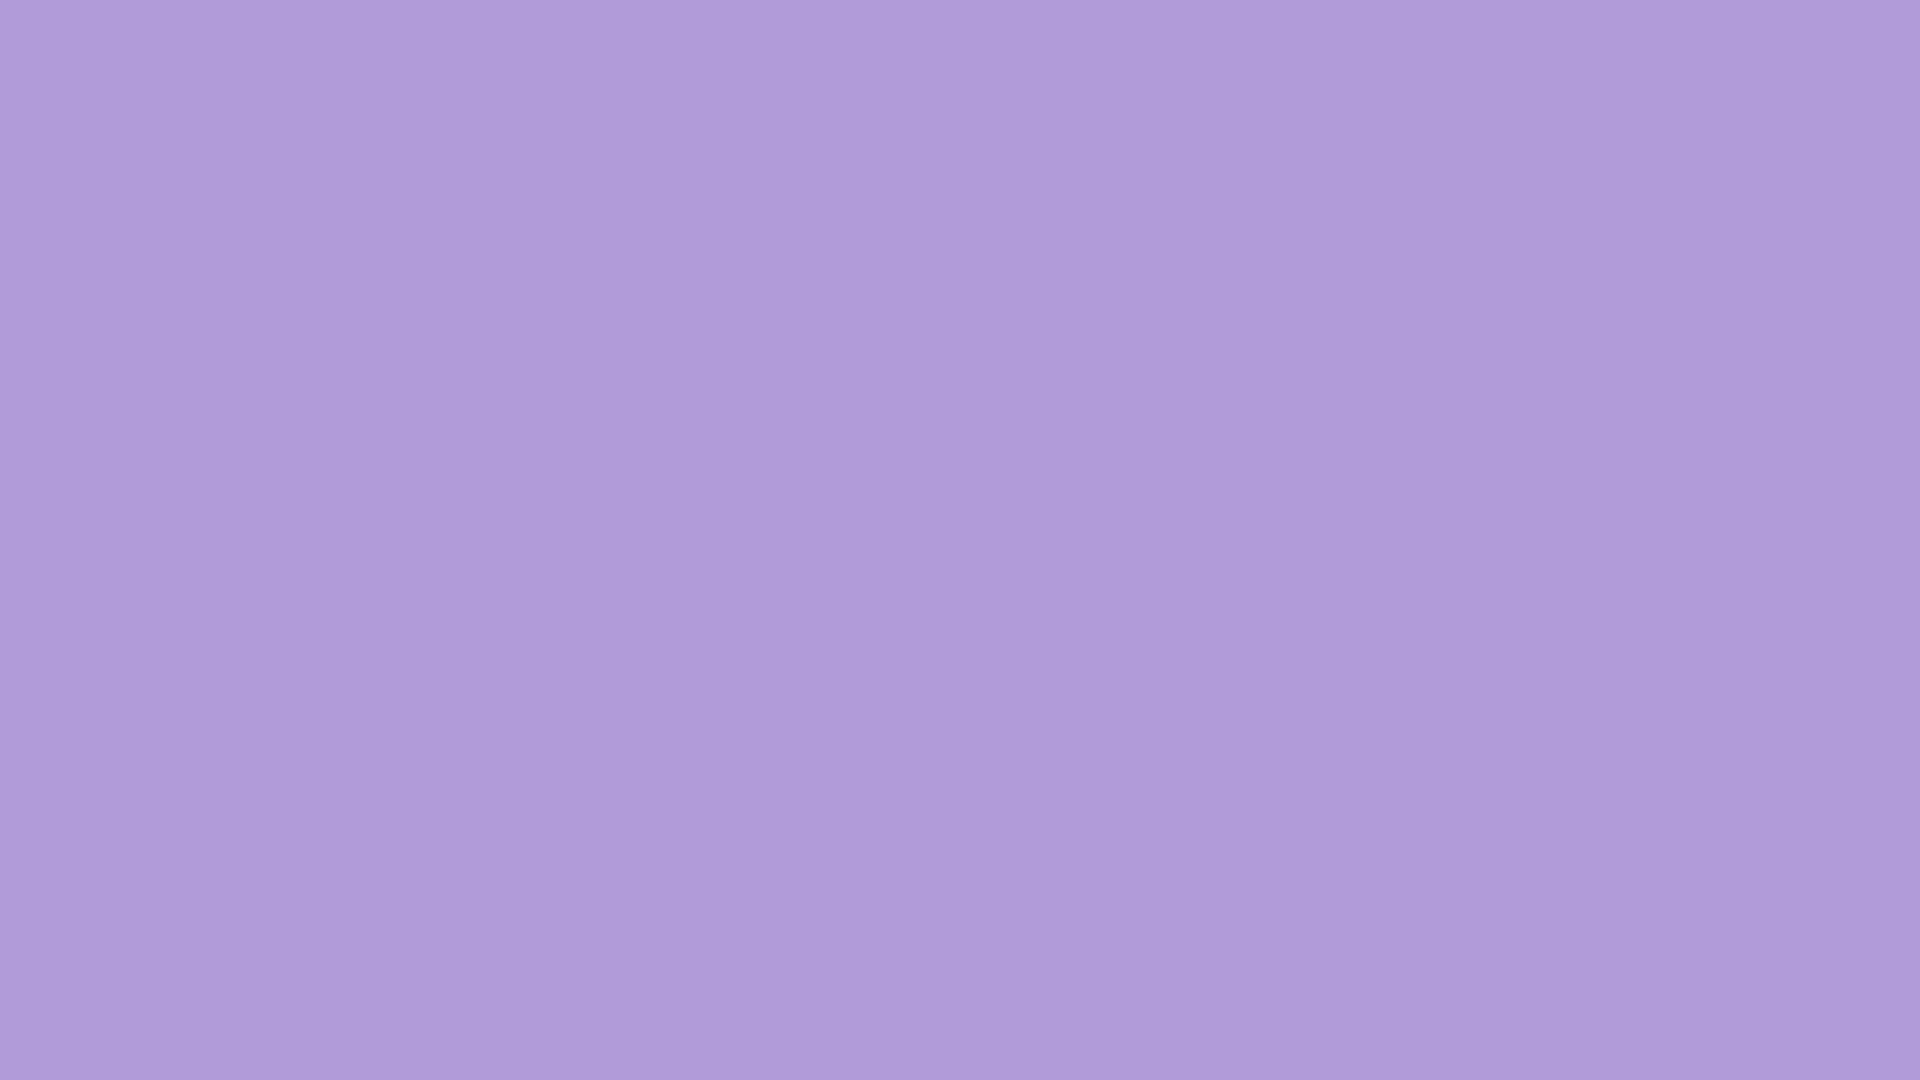 Aesthetic Pastel Purple Wallpaper Iphone Cuteanimals